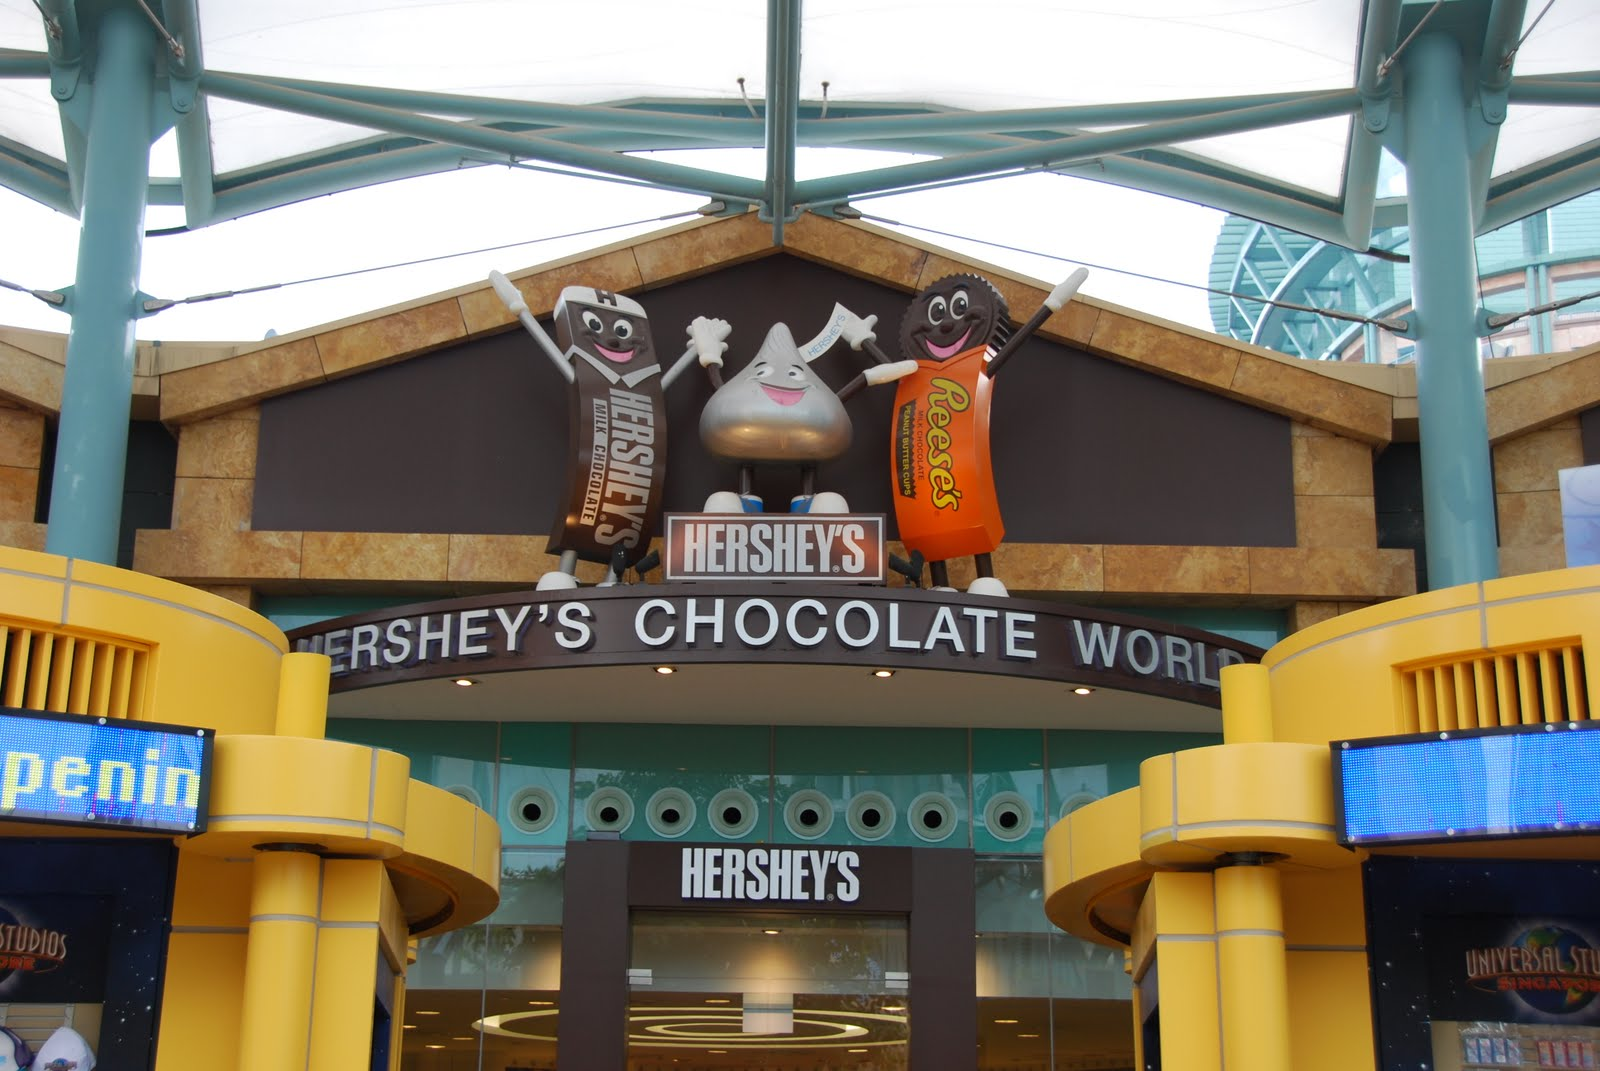 Singapore Weekends: Hershey's Chocolate World